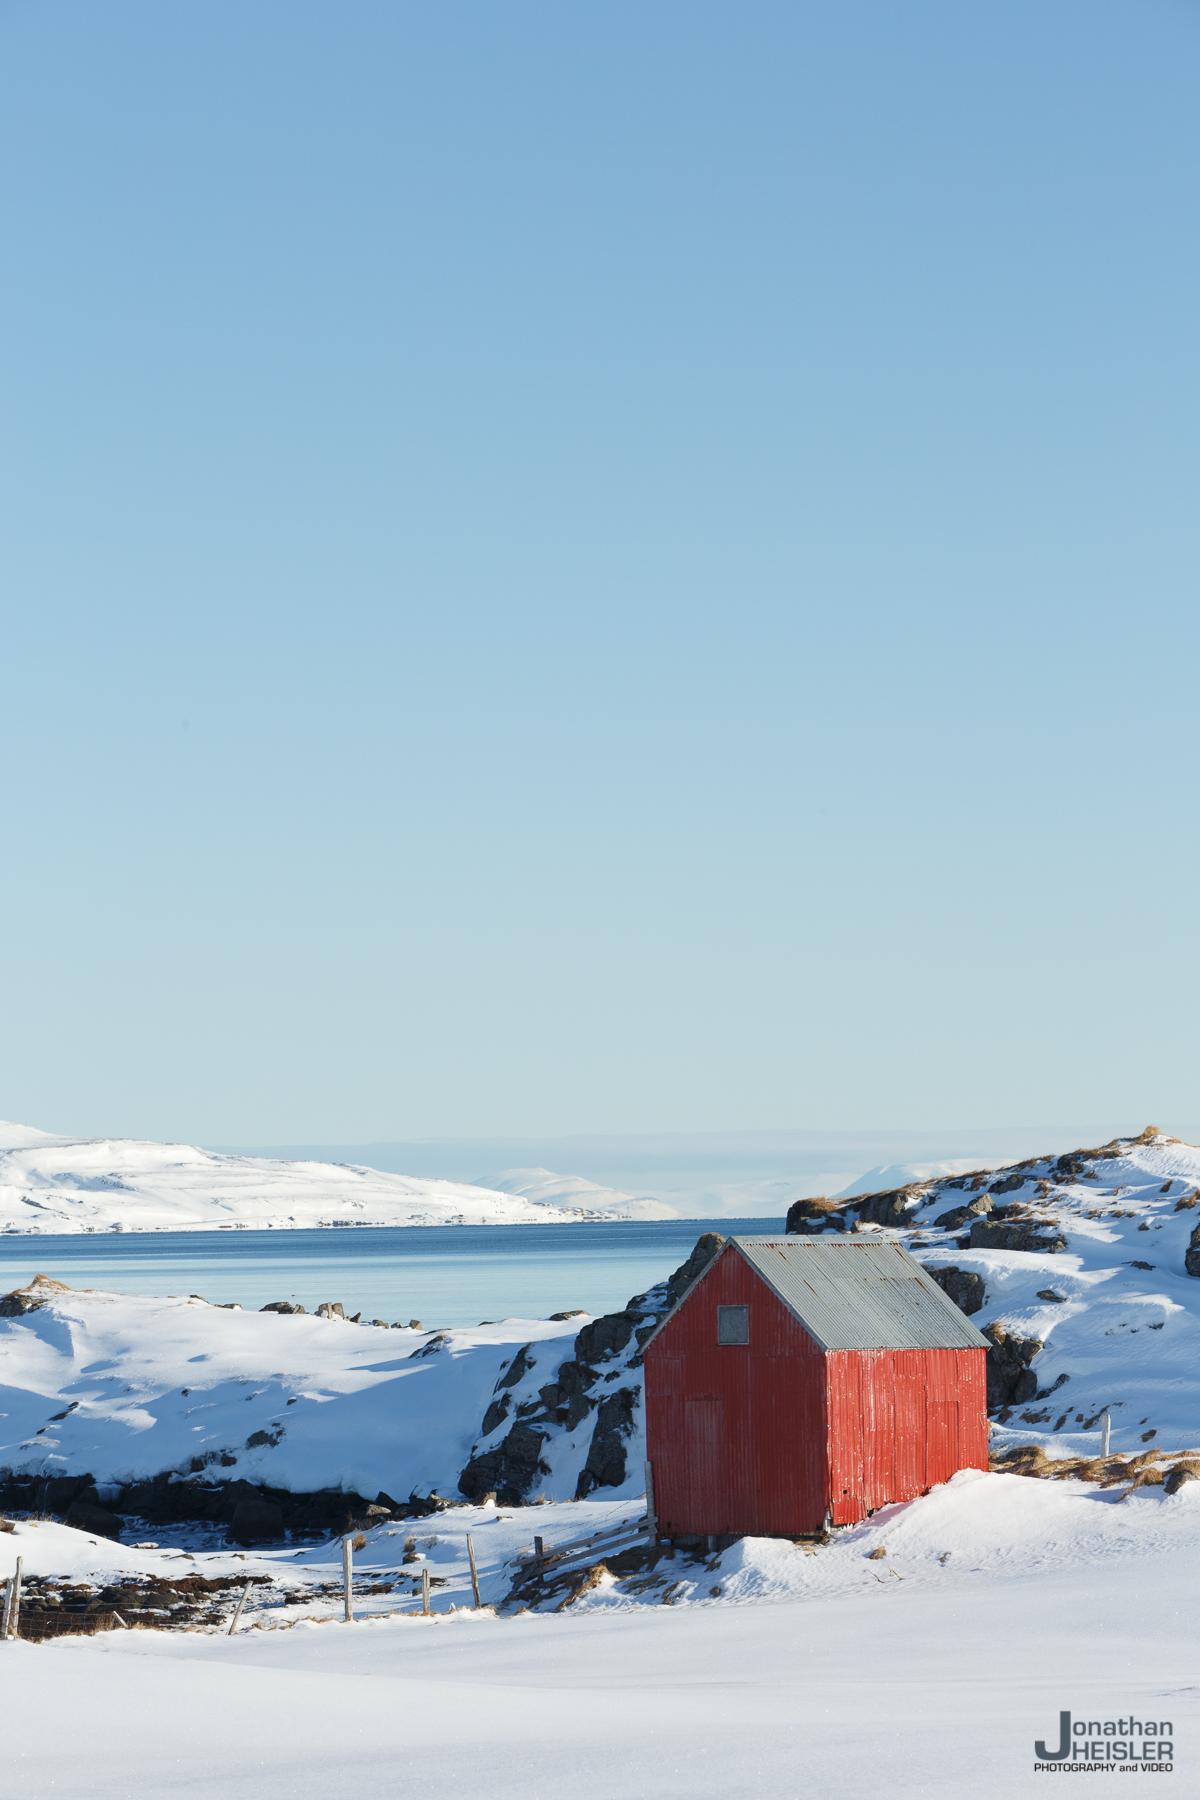 Iceland Winter Photos_  Jonathan Heisler __  02292016 _ 064.jpg